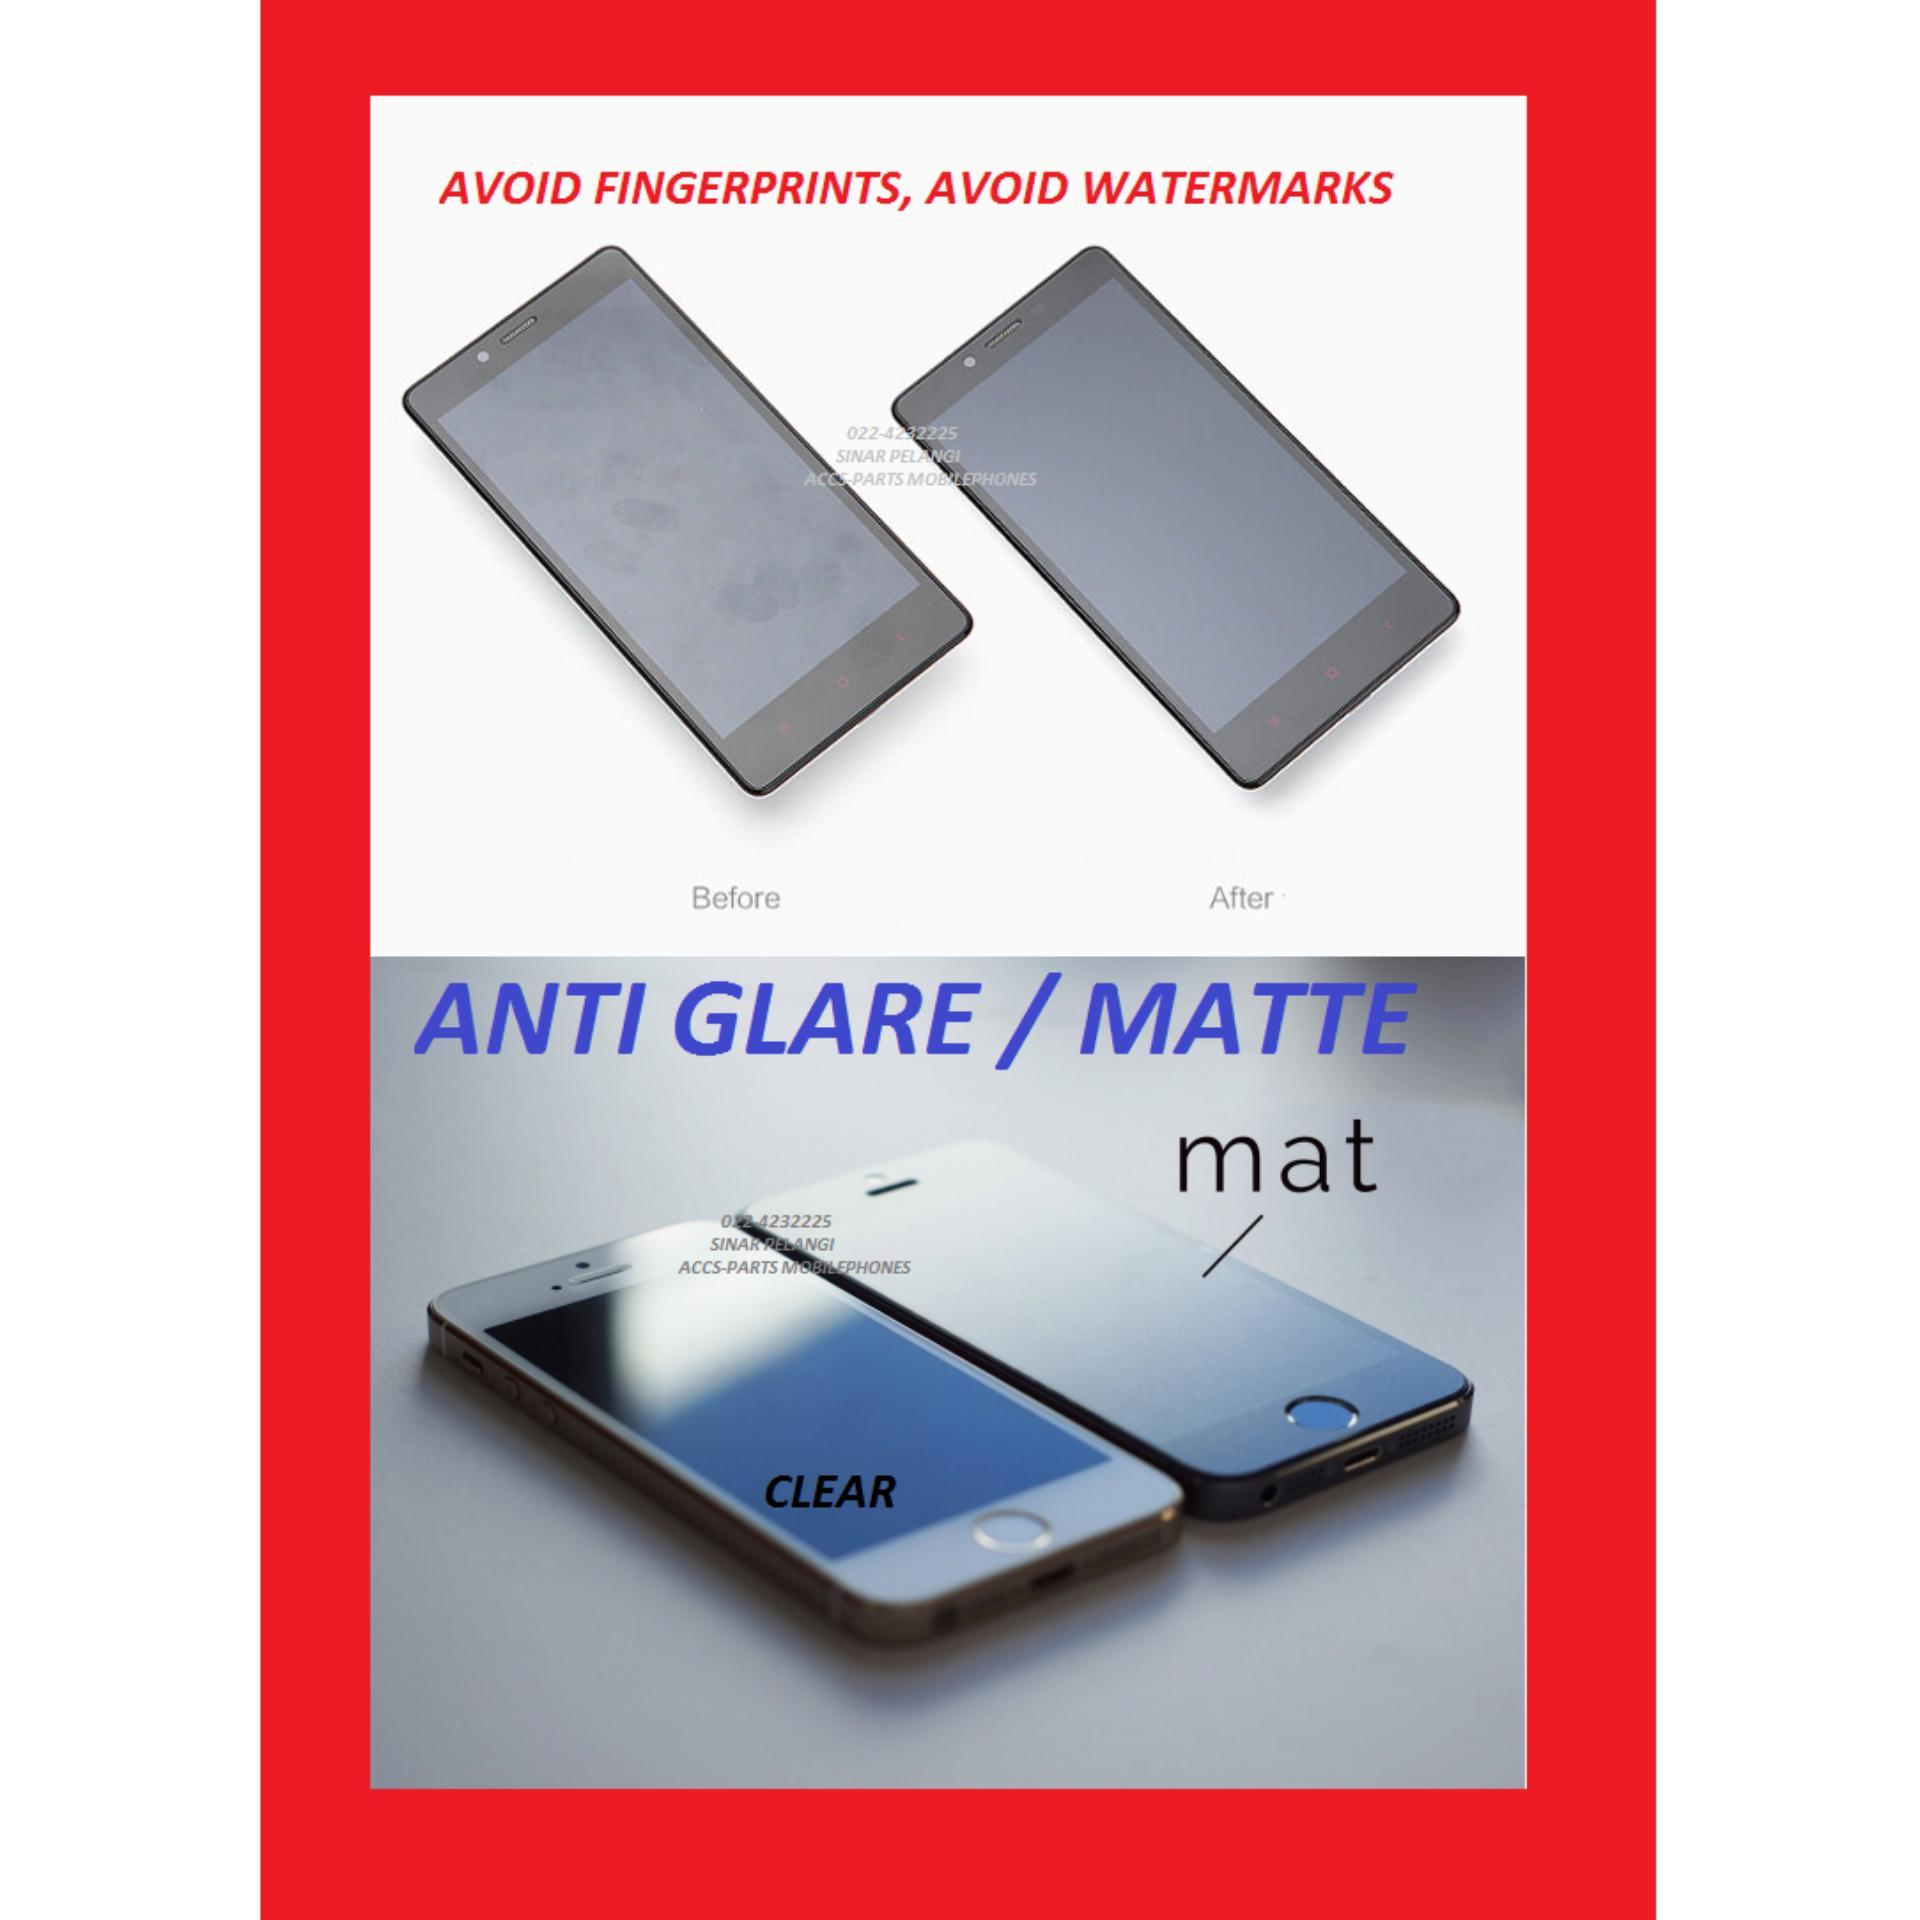 Detail Gambar OPPO SELFIE EXPERT A57 5.2 INCH ANTI GORES GLARE MINYAK MATTE SCREEN GUARD PROTECTOR PELINDUNG LAYAR FINGERPRINTS SCRATCH DEPAN 907367 Terbaru